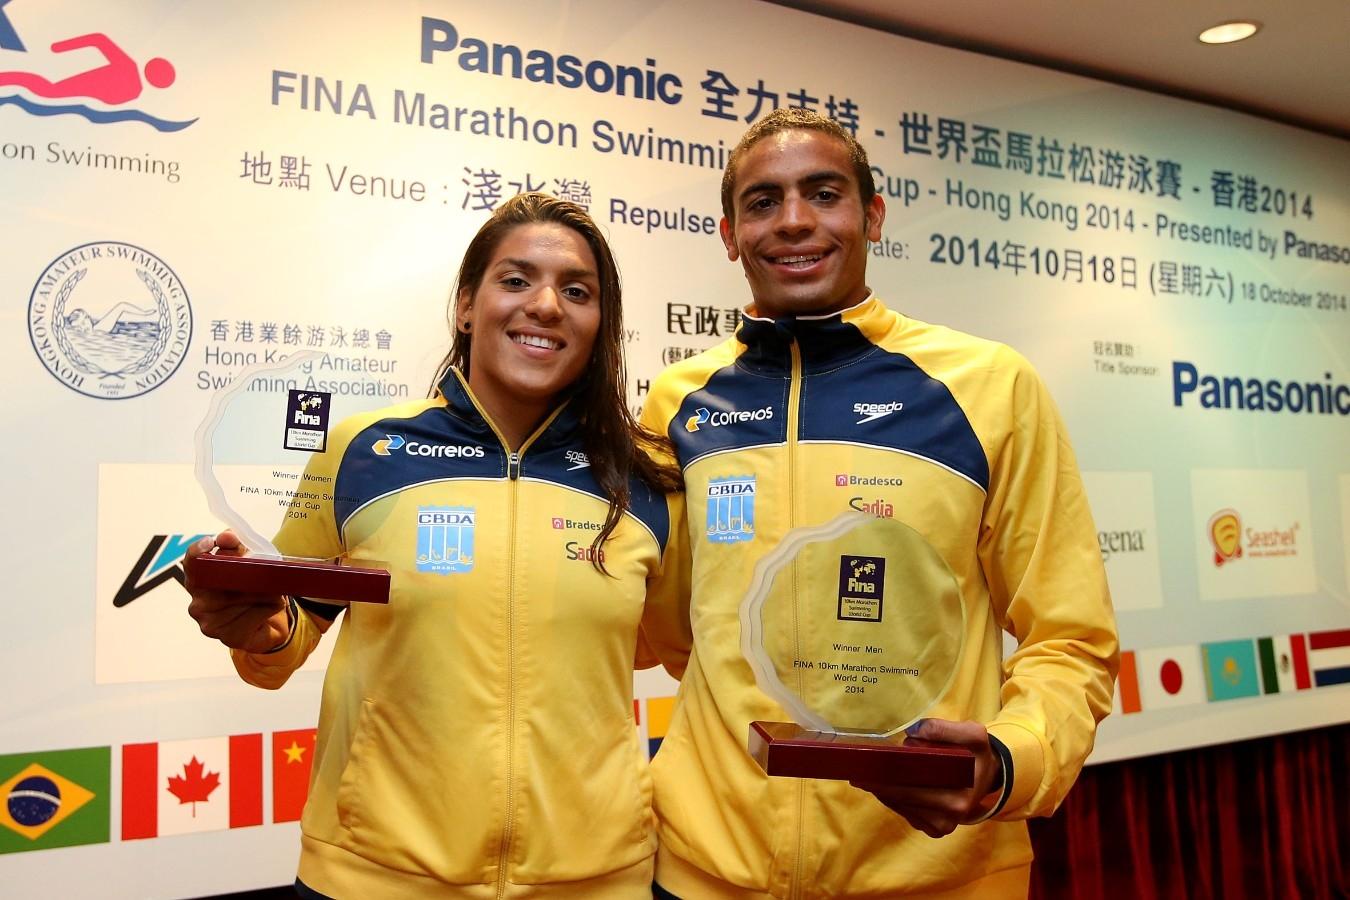 Ana Marcela, Allan do Carmo. Copa do Mundo de Maratonas Aquaticas, etapa Travessia de Hong Kong na Repulse Bay. 18 de Outubro de 2014, Hong Kong. Foto: Satiro Sodre/SSPress.